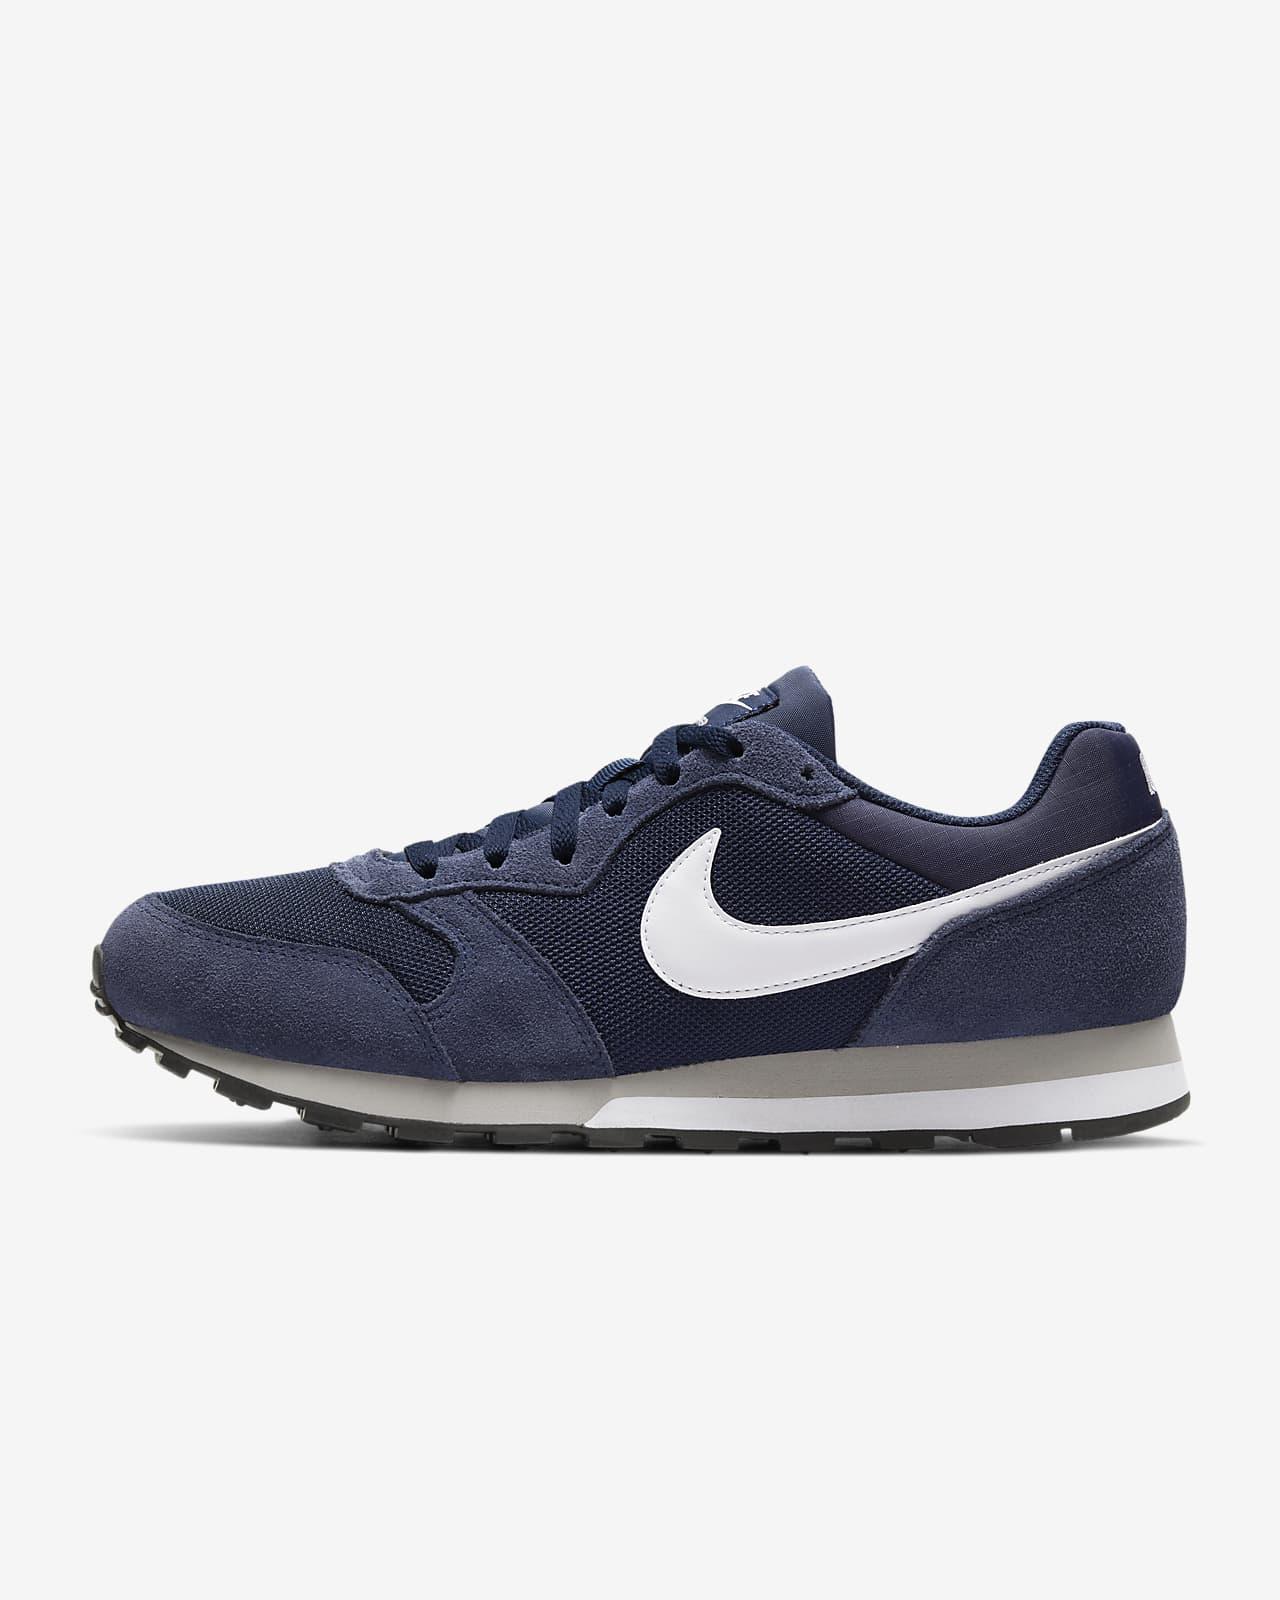 Nike MD Runner 2 Men's Shoe. Nike LU